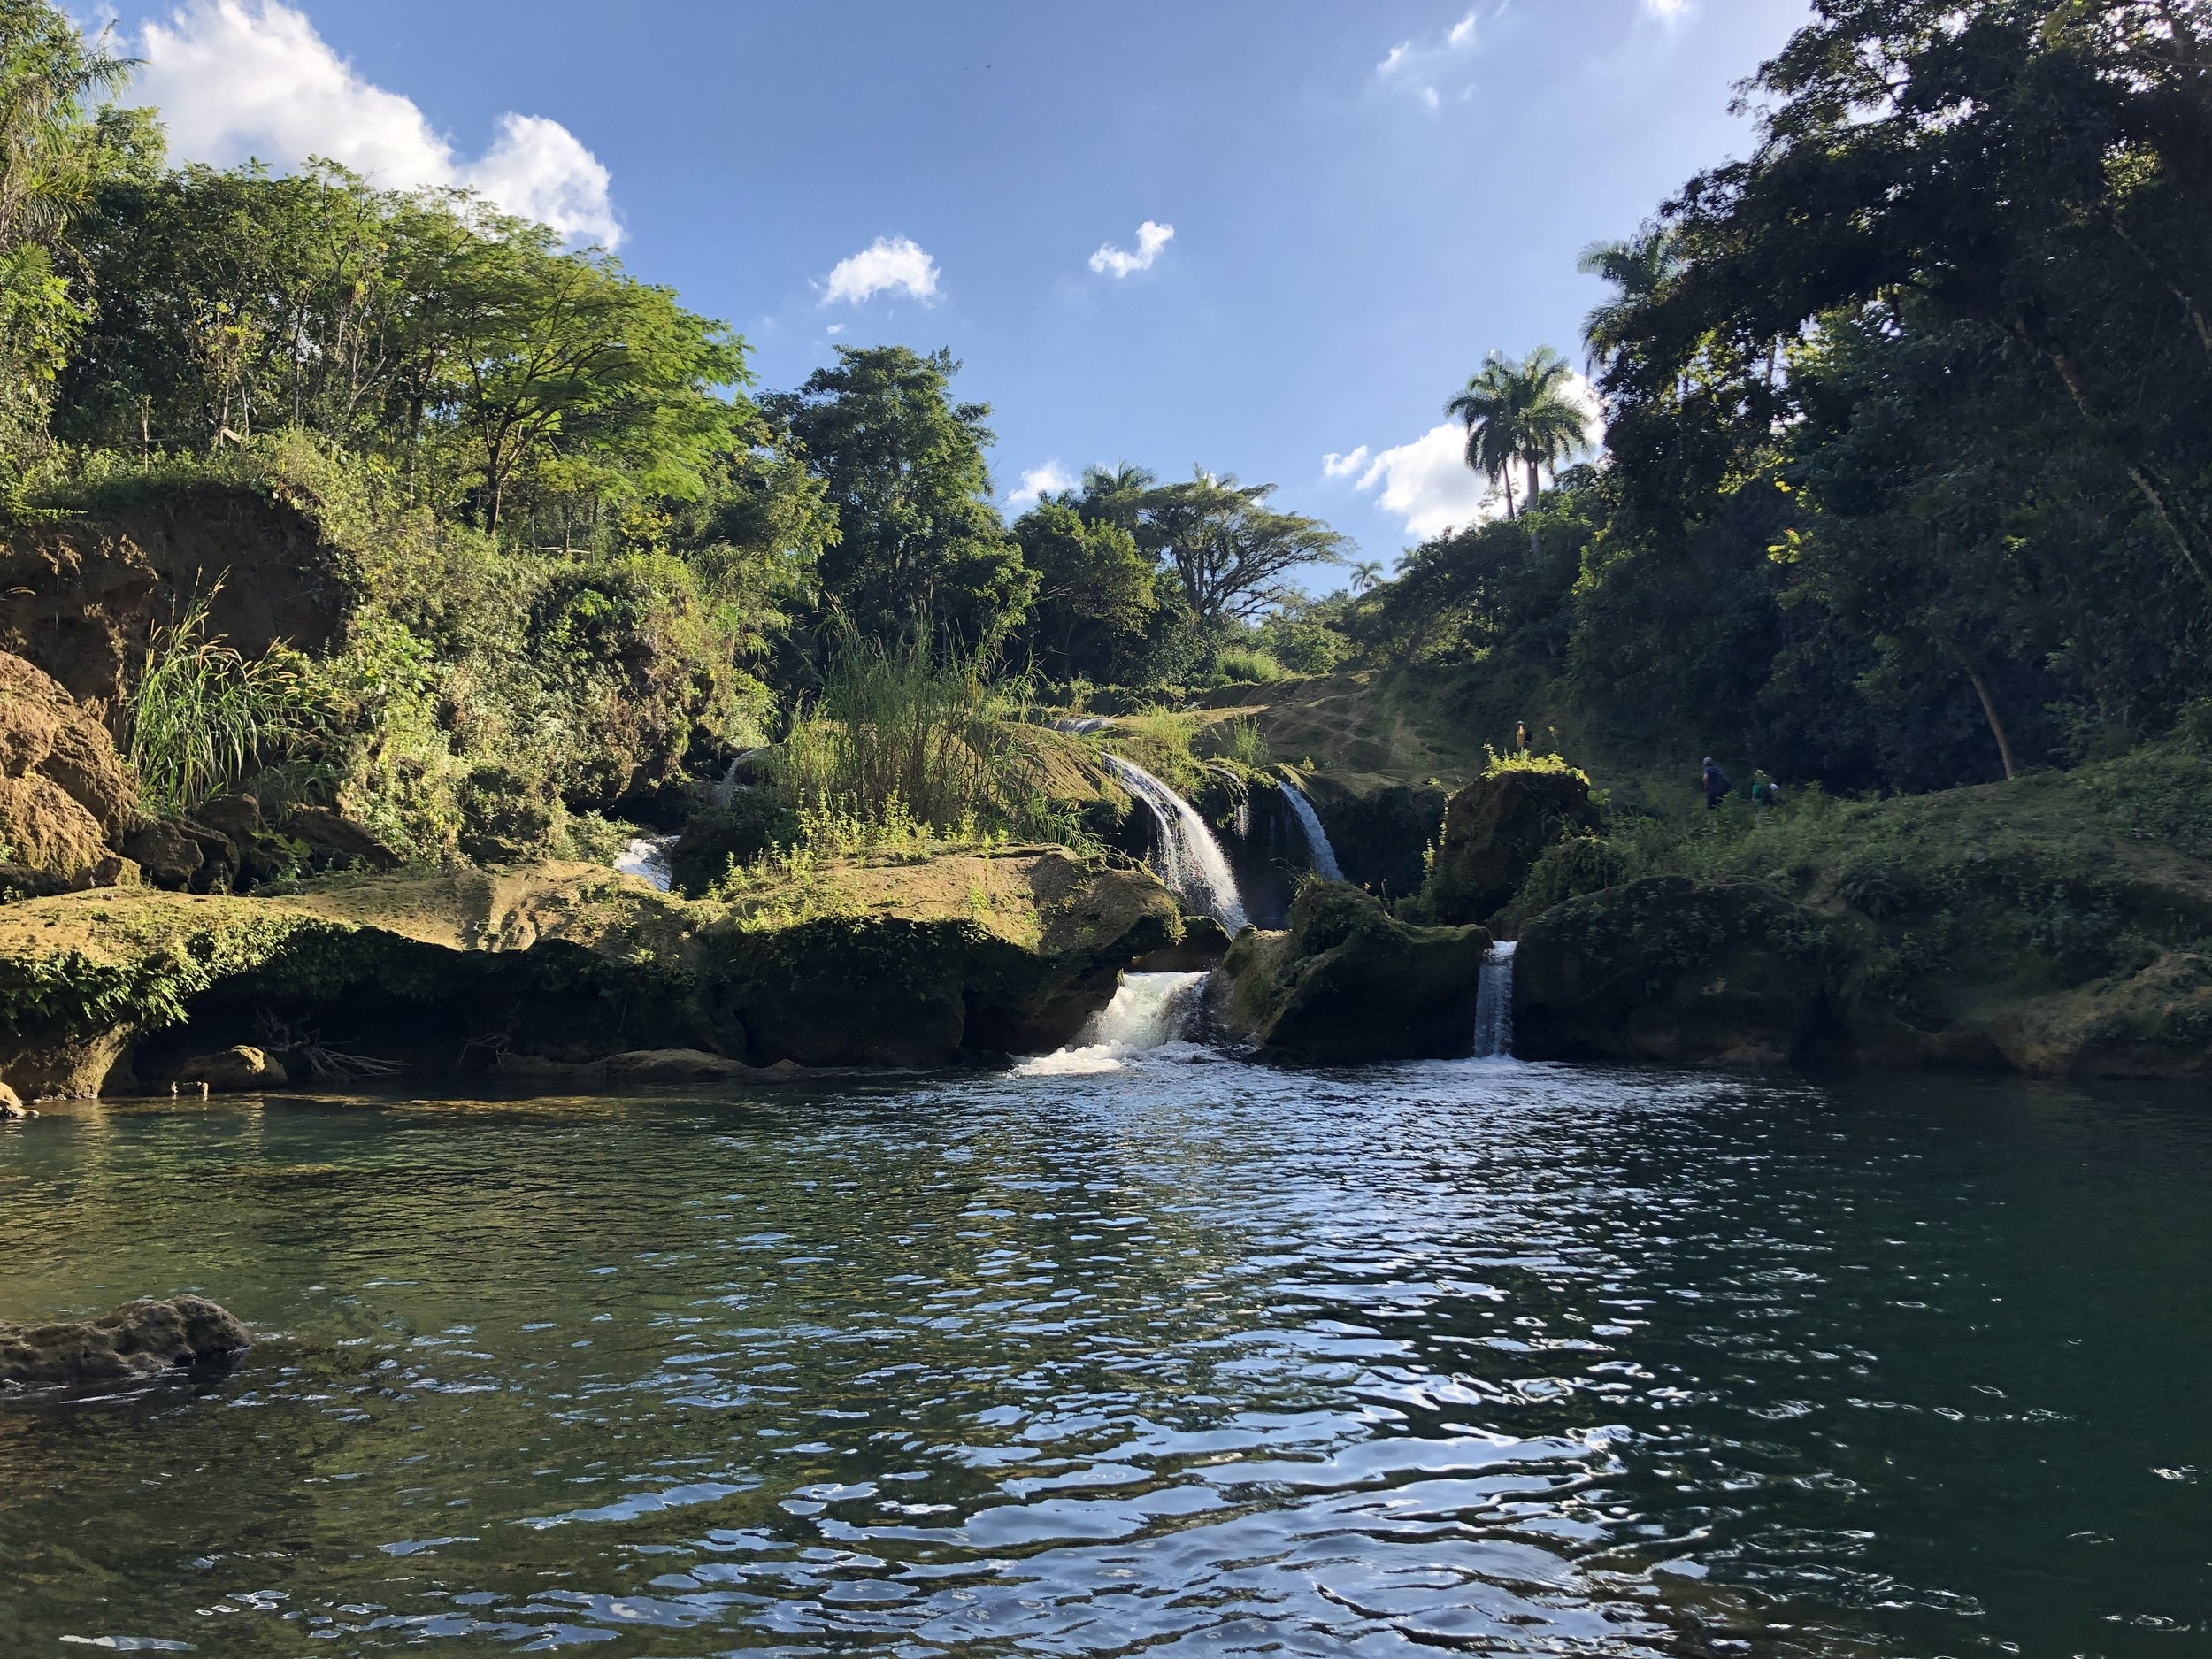 El Nicho - A natural park in the Escambray Mountains